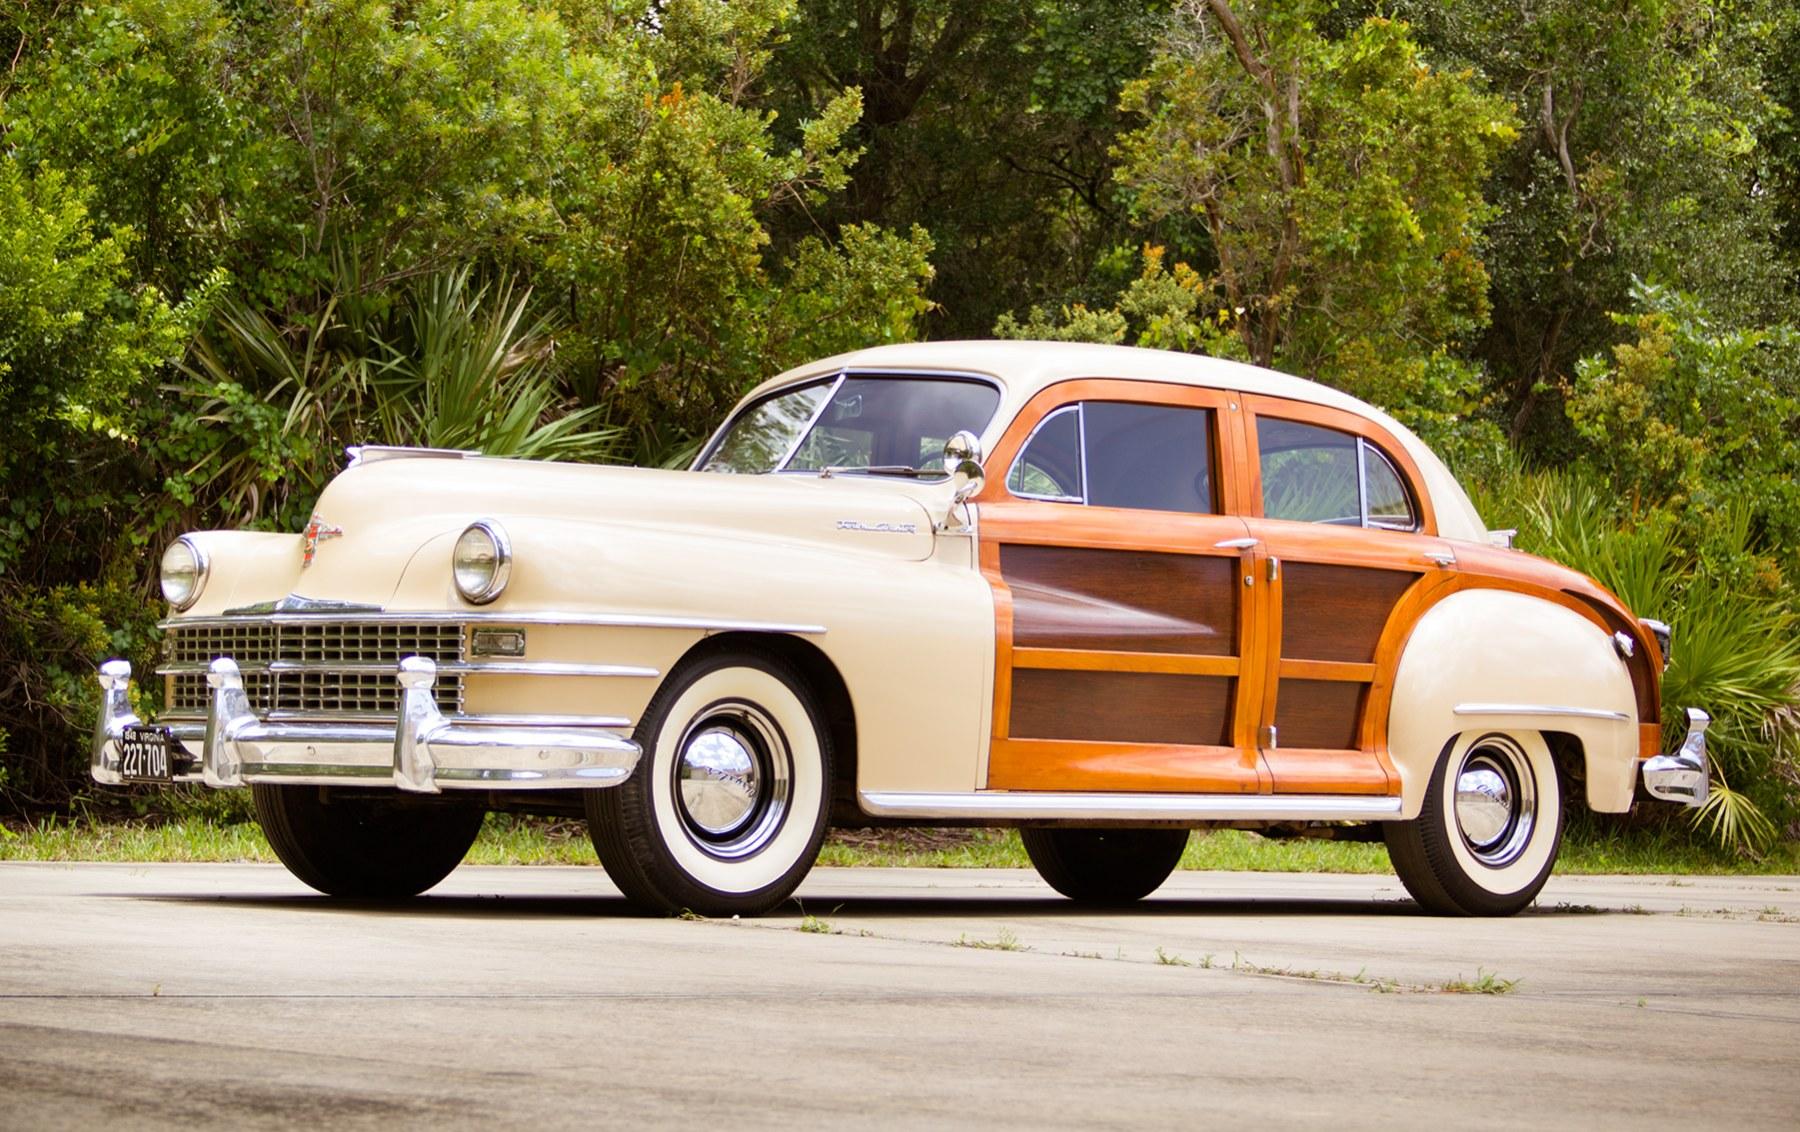 1948 Chrysler Town and Country Sedan-2